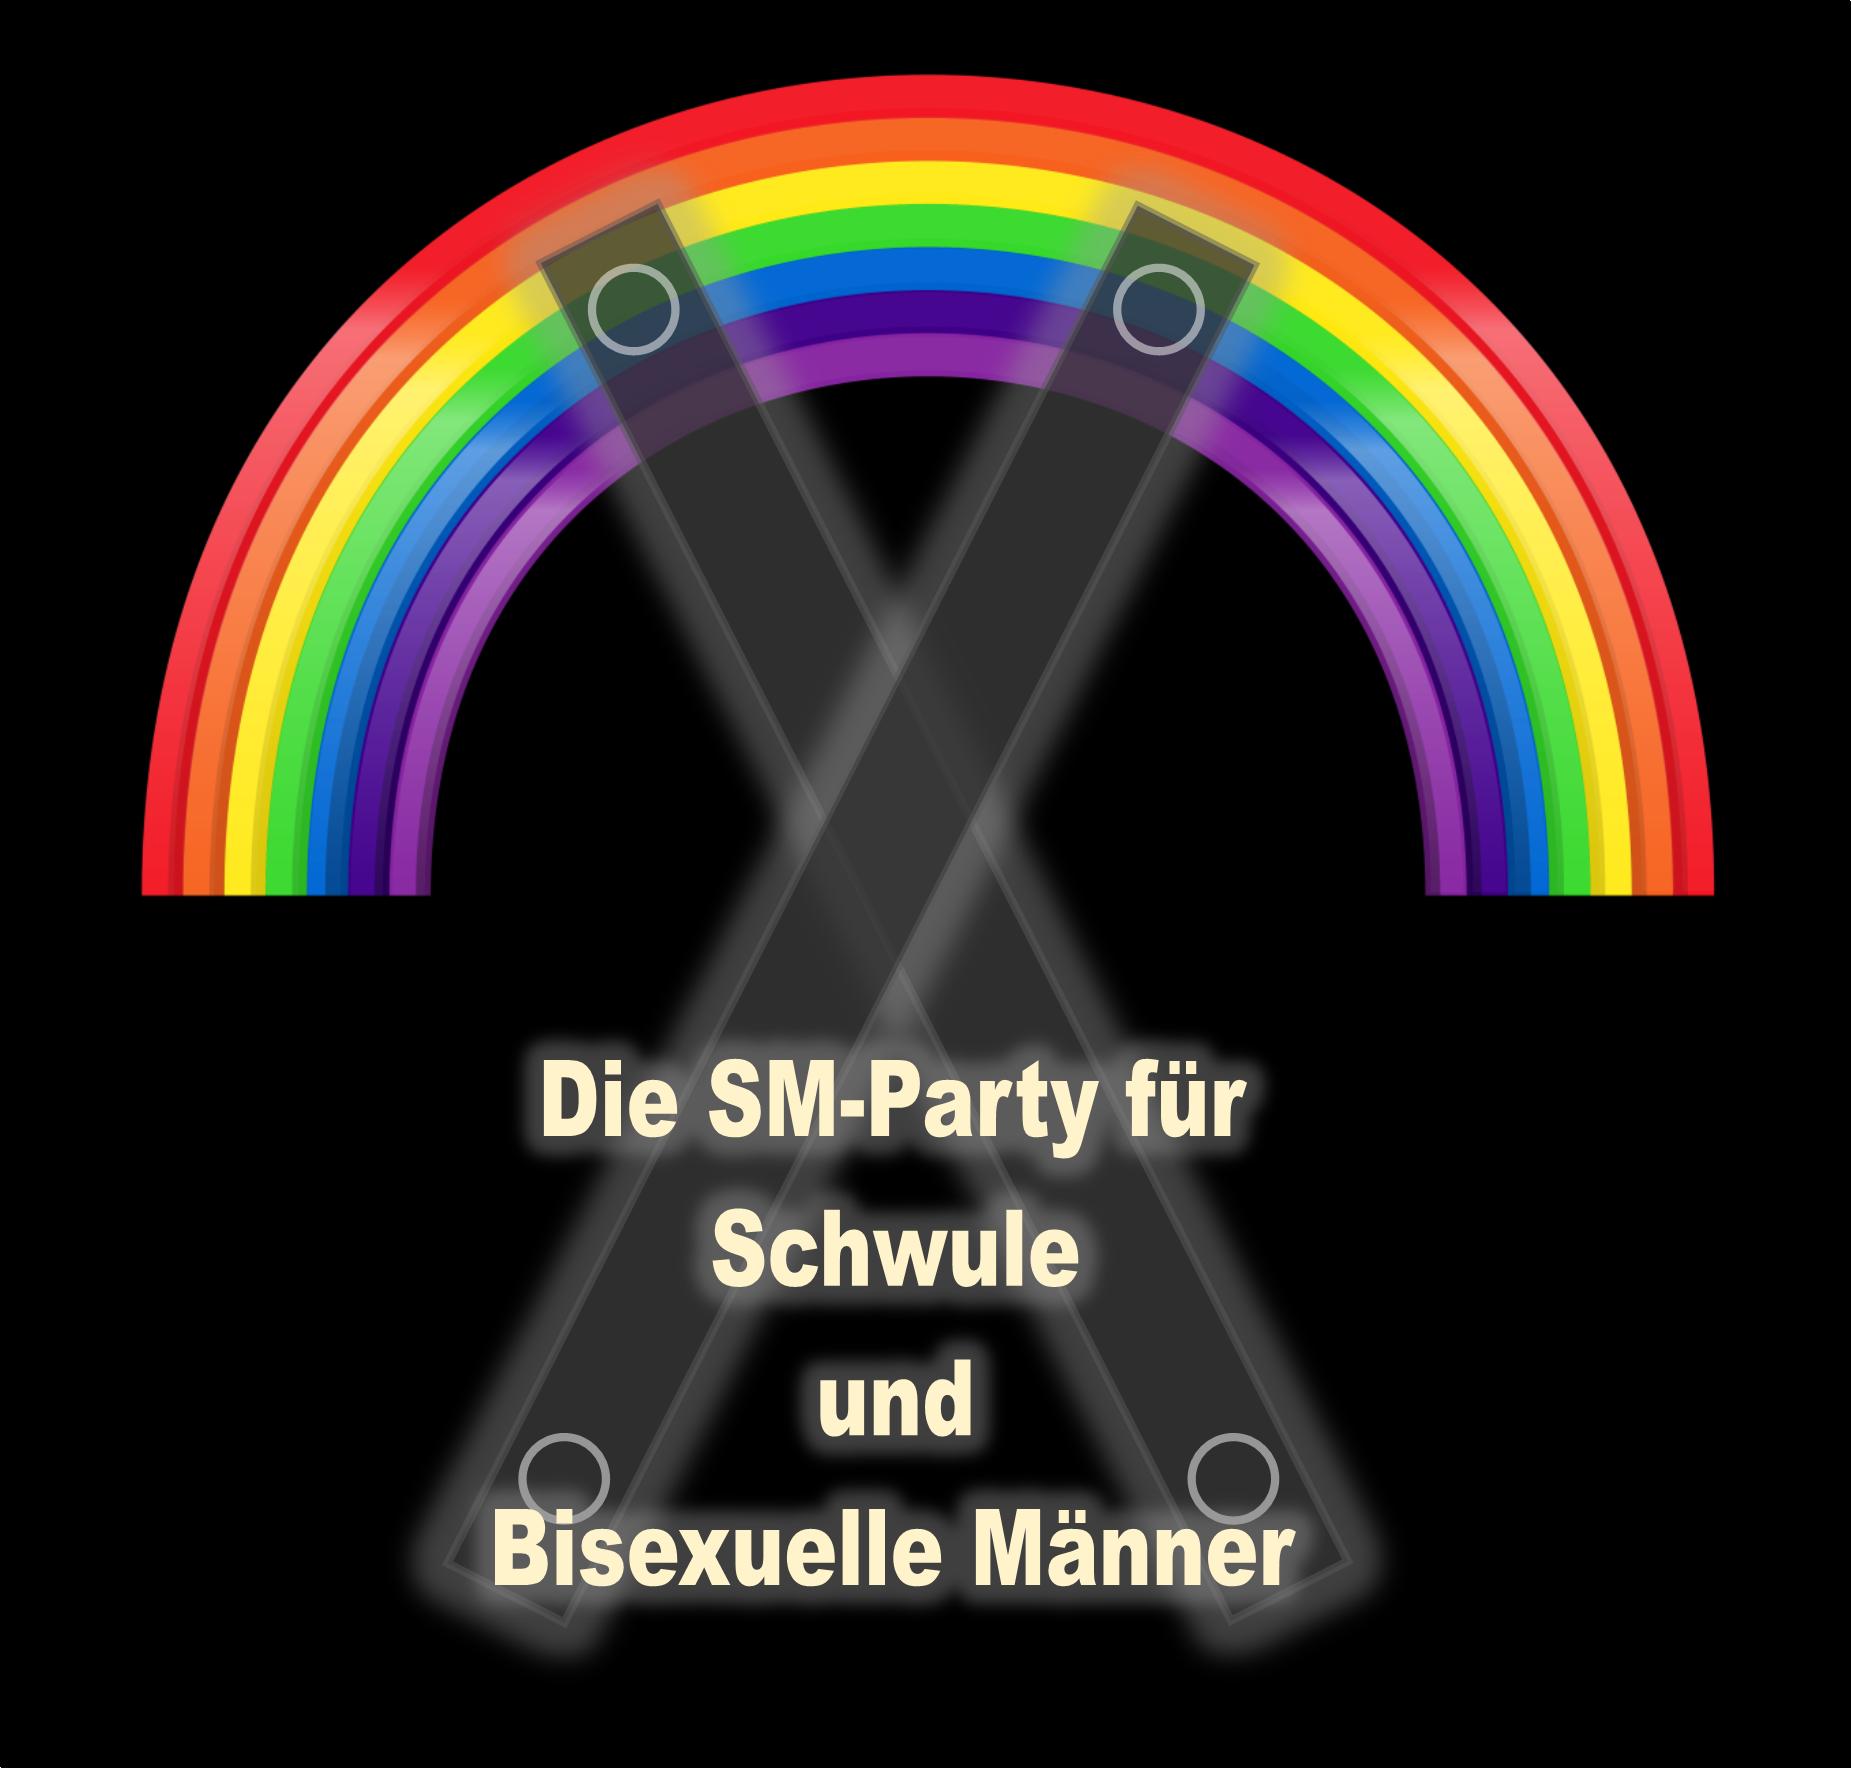 spagat sex gay party dortmund